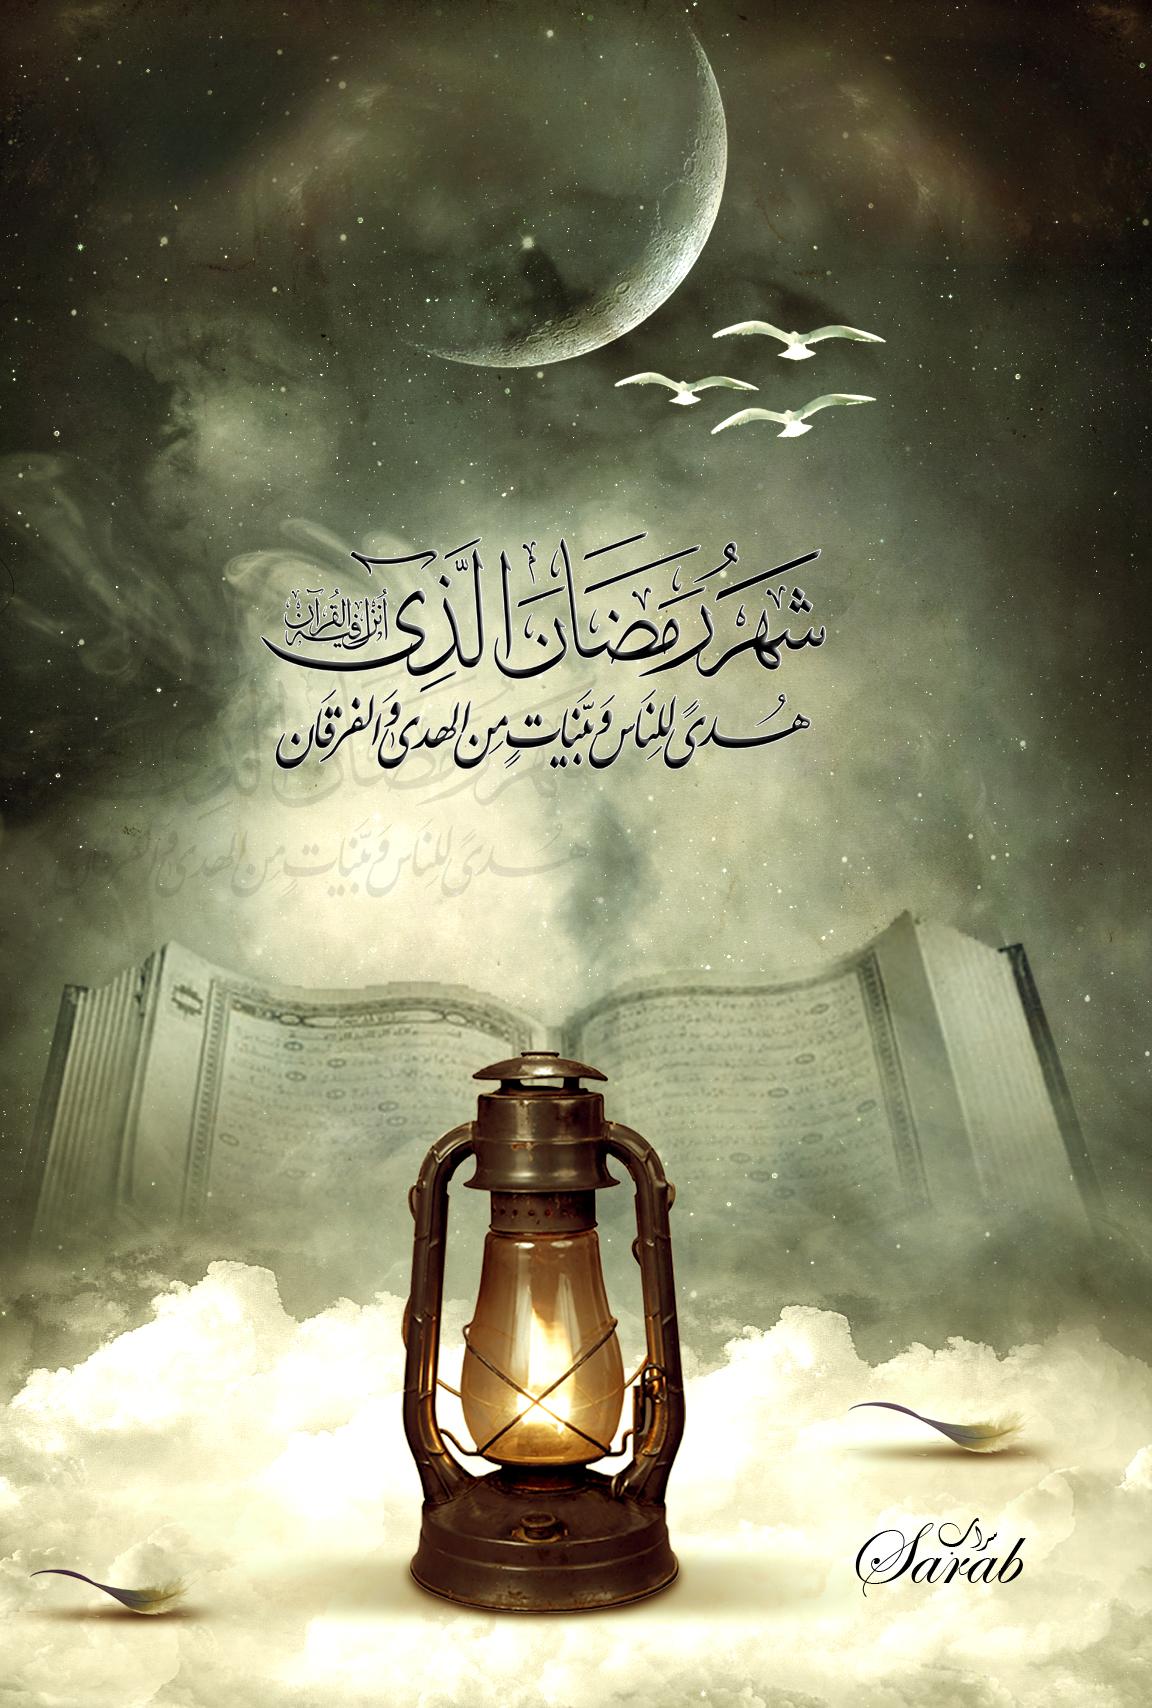 http://fc00.deviantart.net/fs70/f/2011/214/7/7/ramadan_kareem_by_sarab1400-d42noq6.jpg